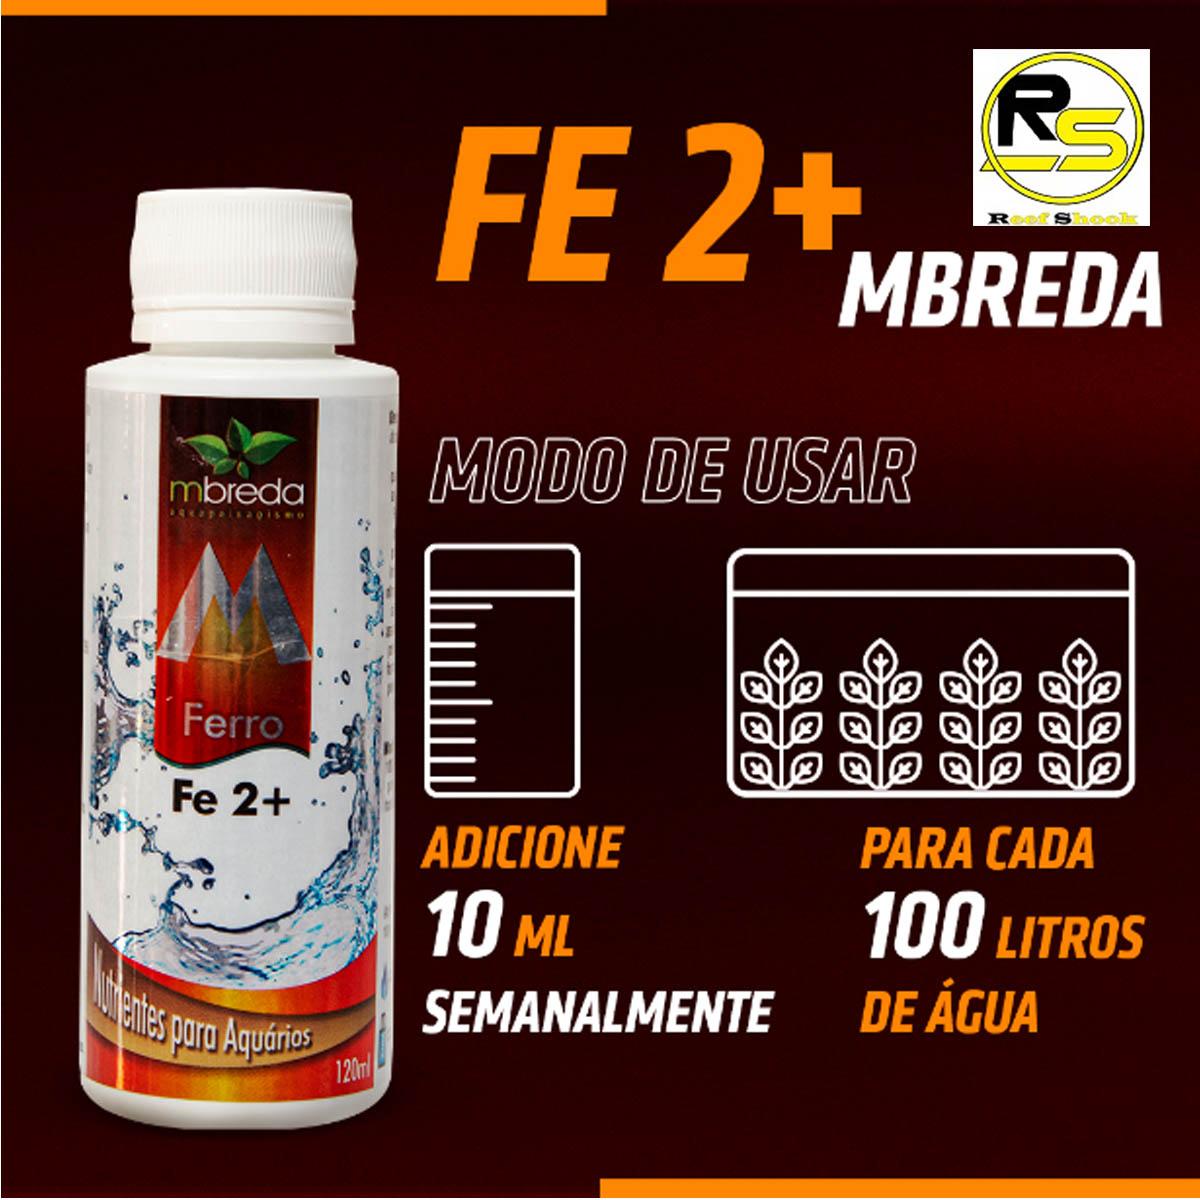 Fertilizante Ferro Fe2+ Mbreda 120ml para Aquario Plantado